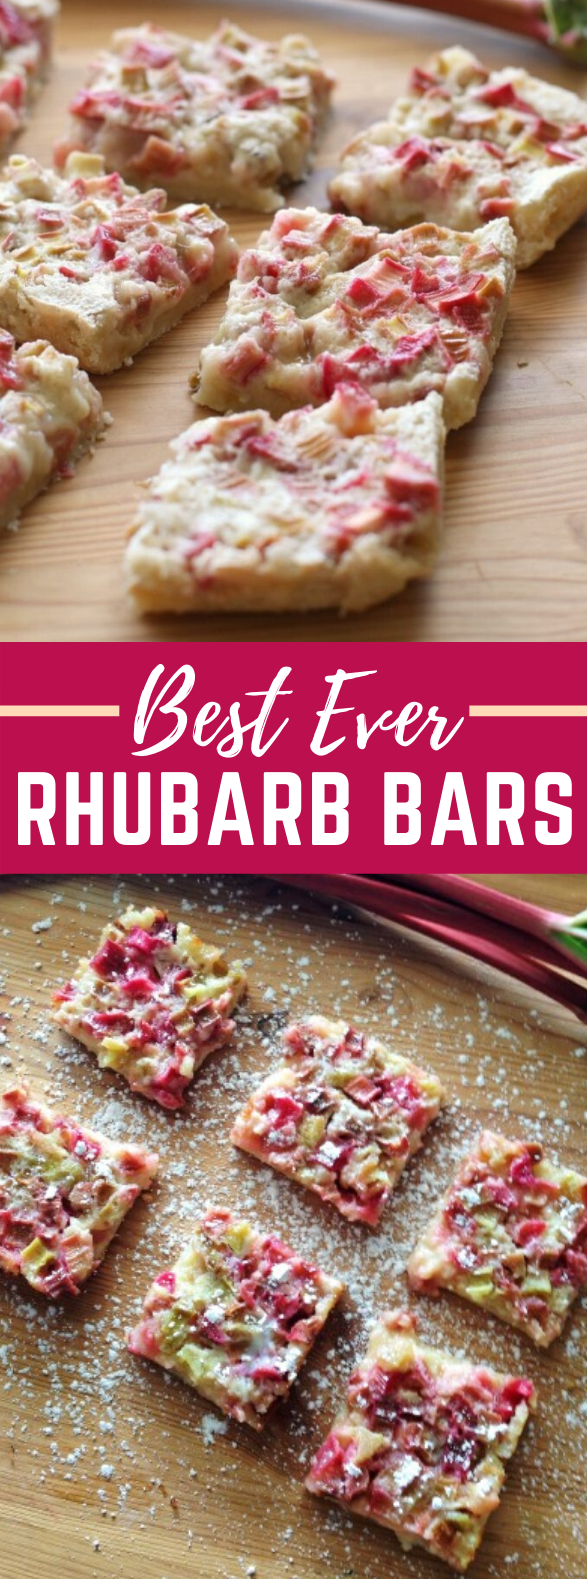 Rhubarb Bars #desserts #cake